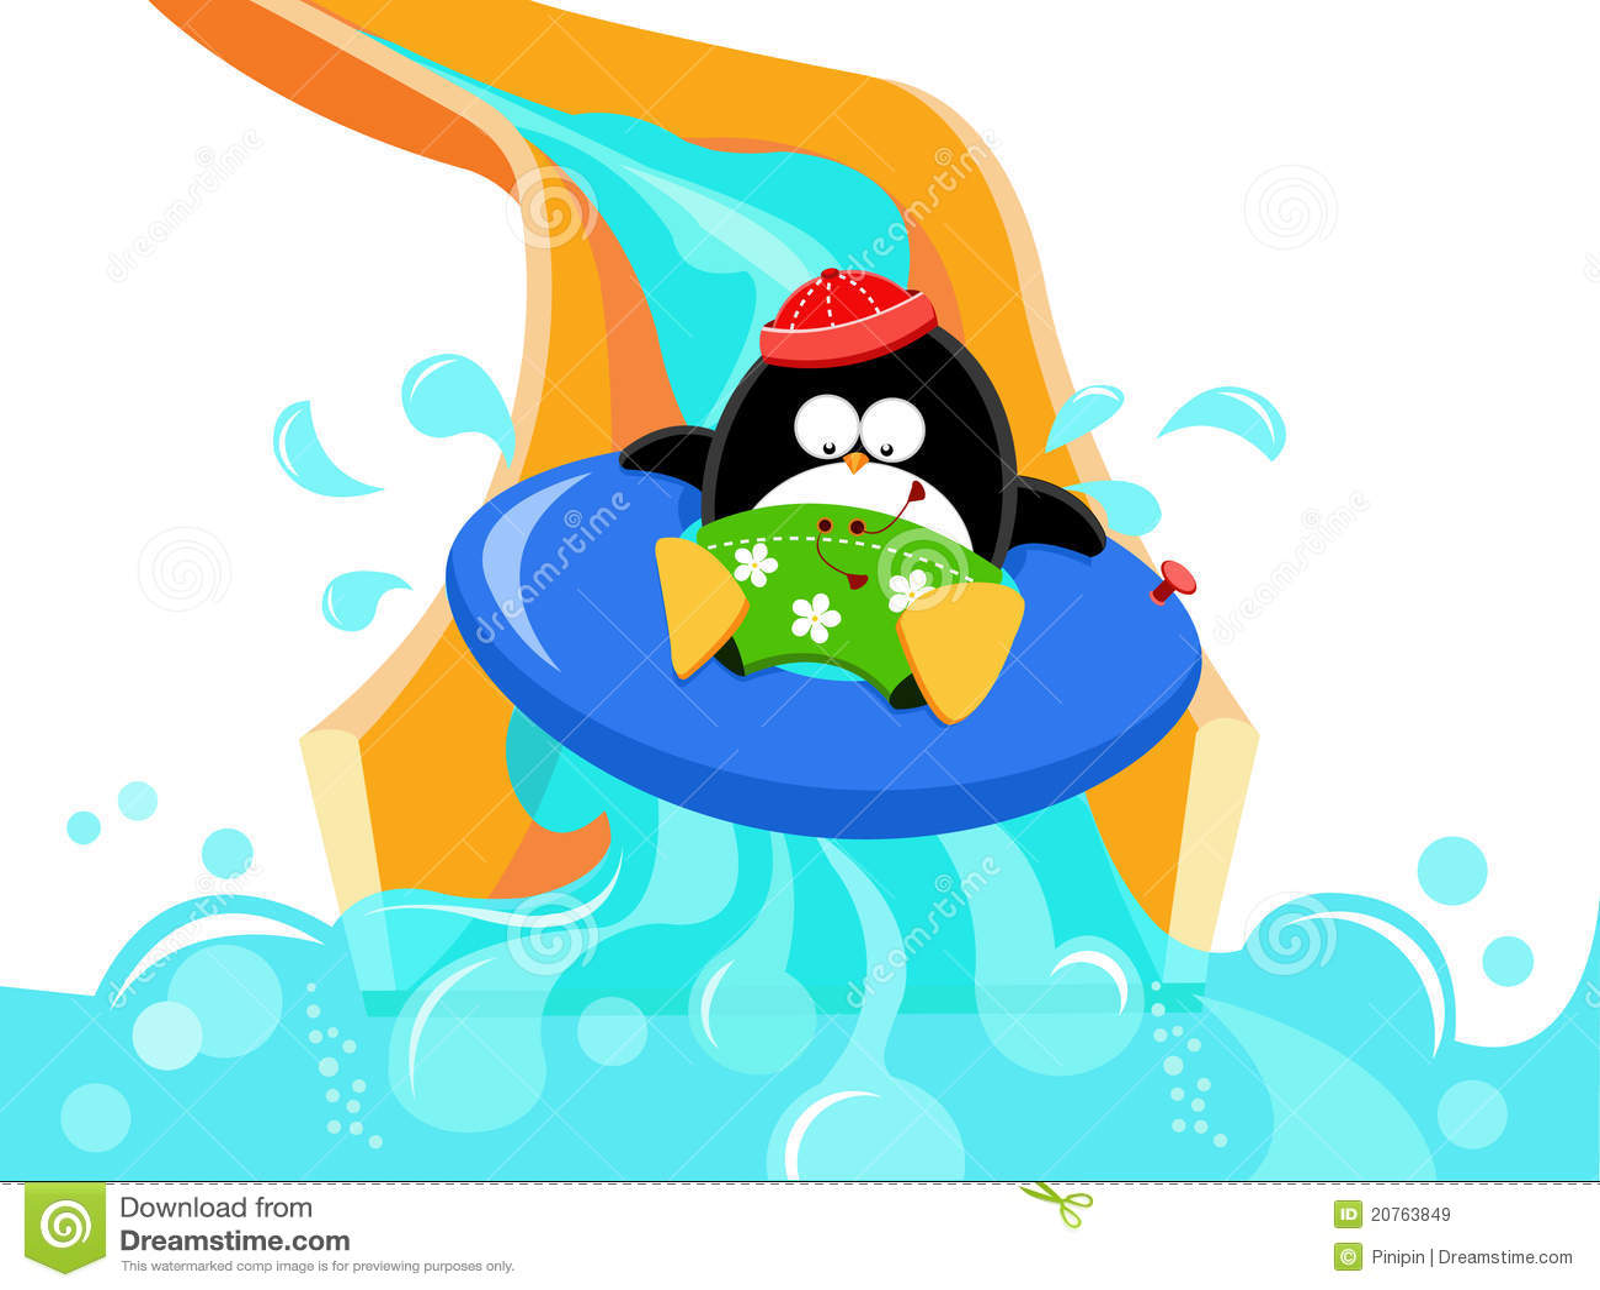 Kid N Play Cartoon Characters : Penguin on water slide stock vector illustration of